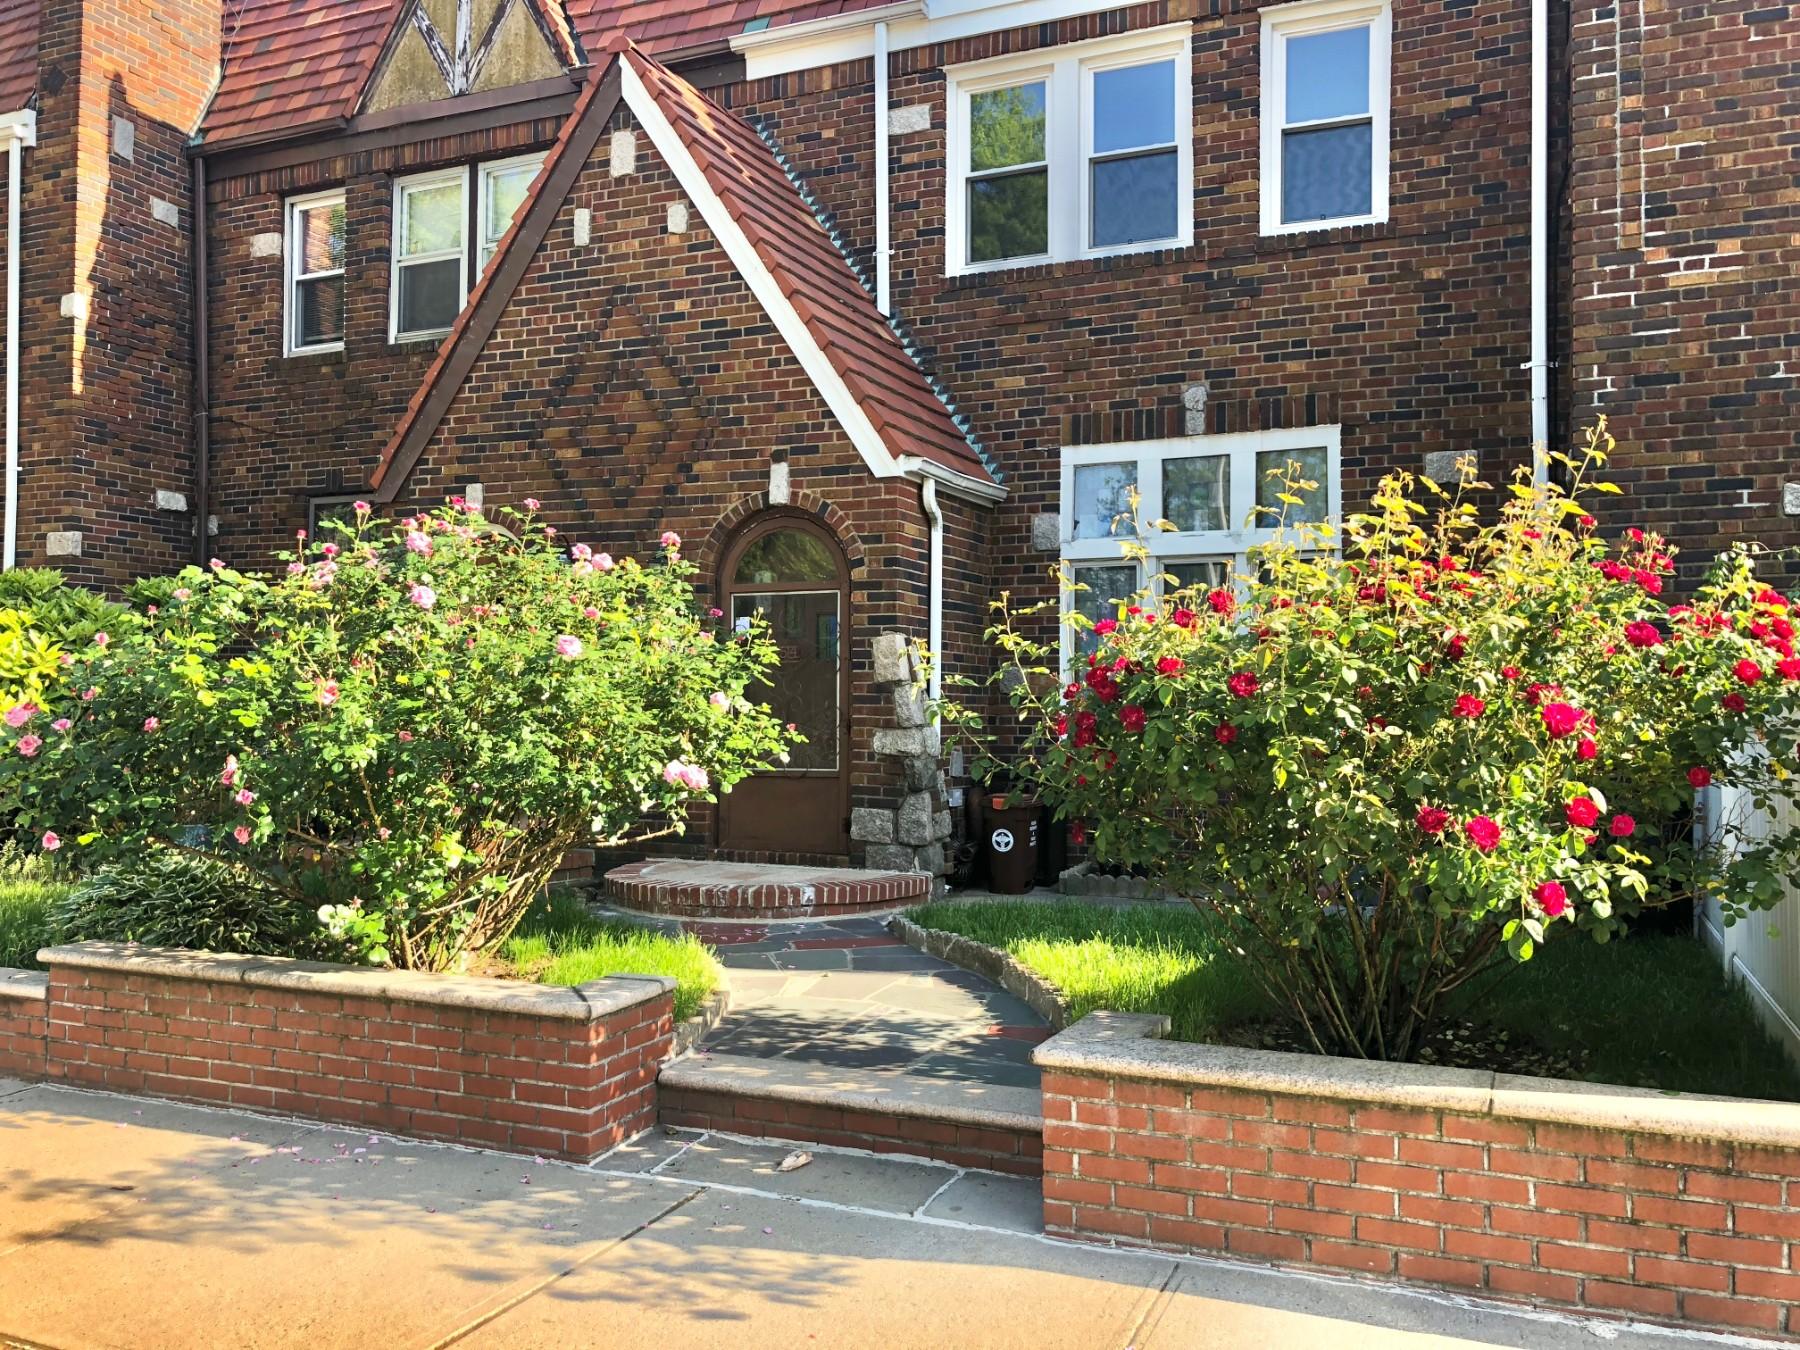 3 House in Queens Village